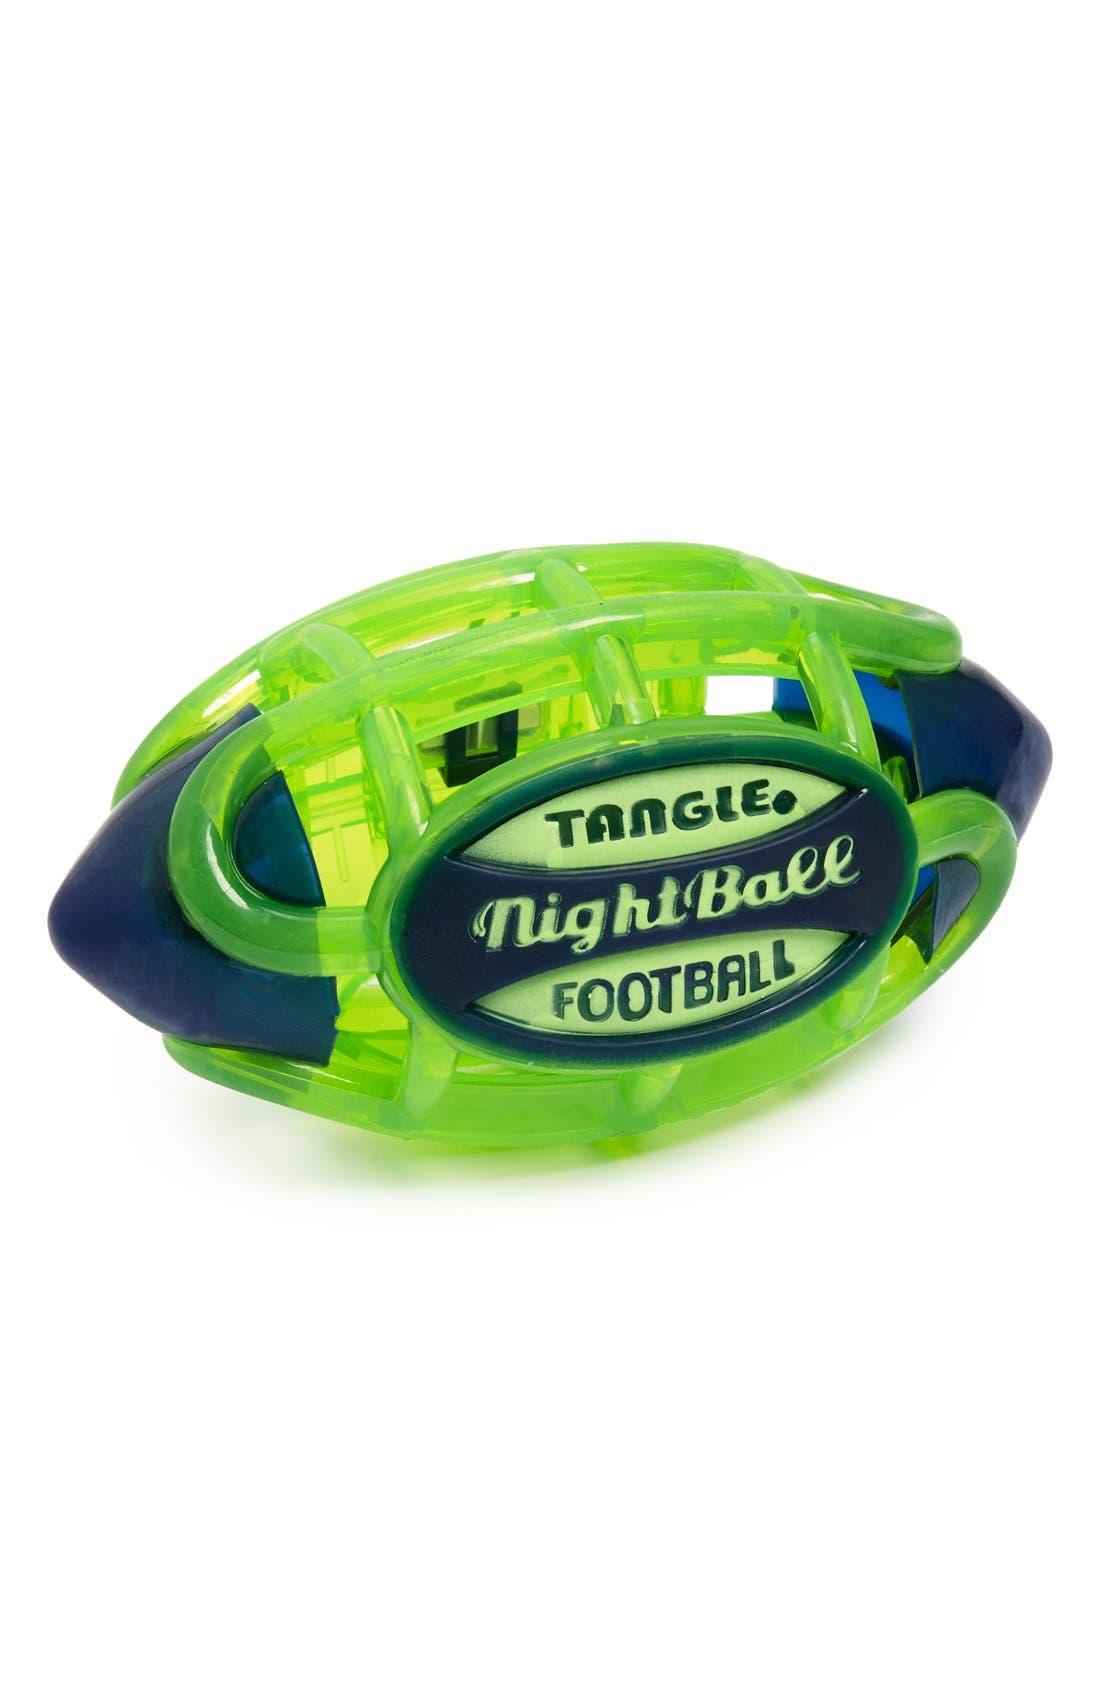 Tangle 'NightBall' Large Football